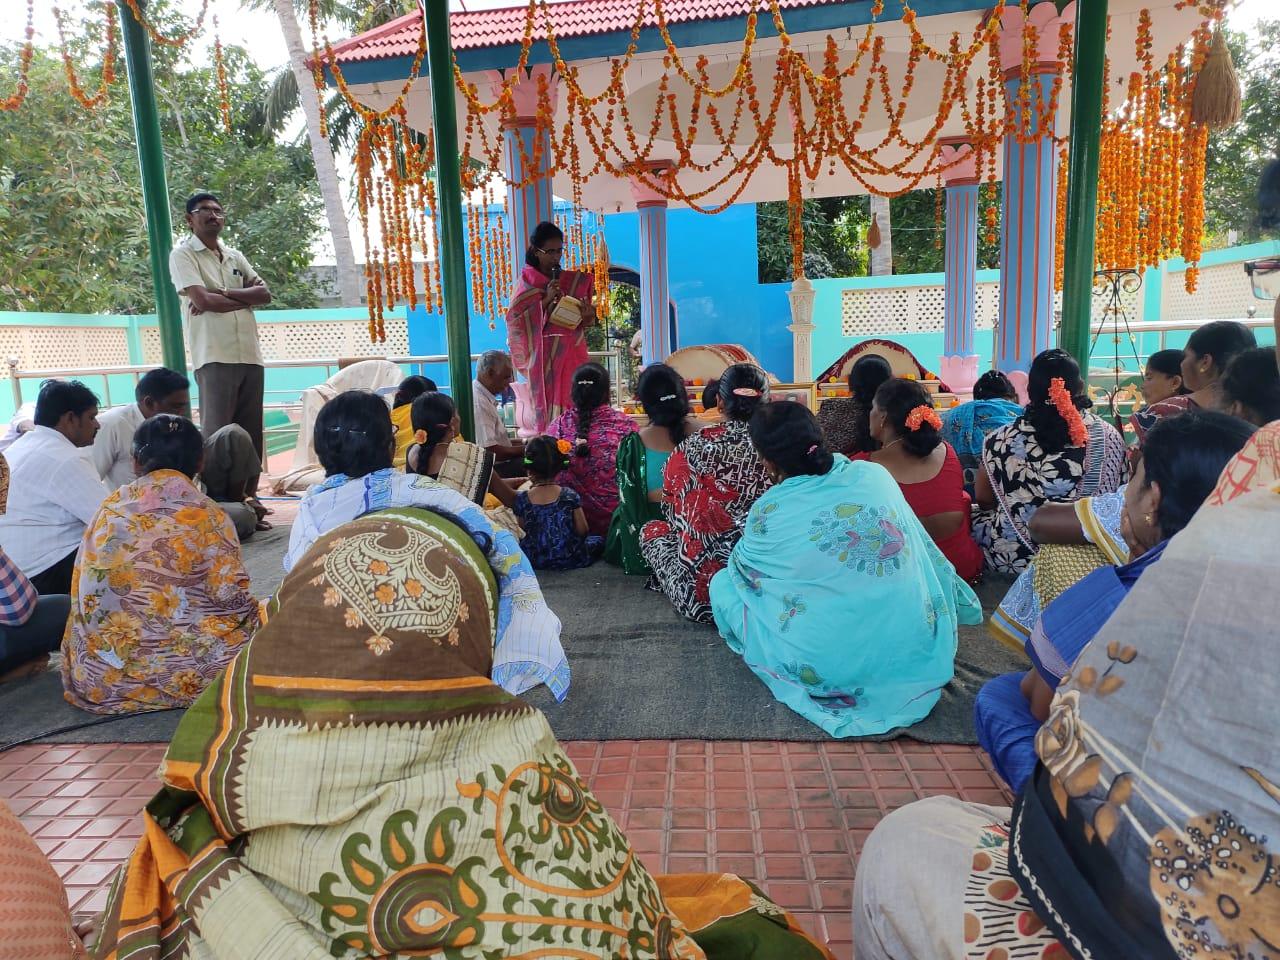 India-Aaradhana conducted at Sri Kahene Sha Vali Ashram, Tuni on 9th March 2020